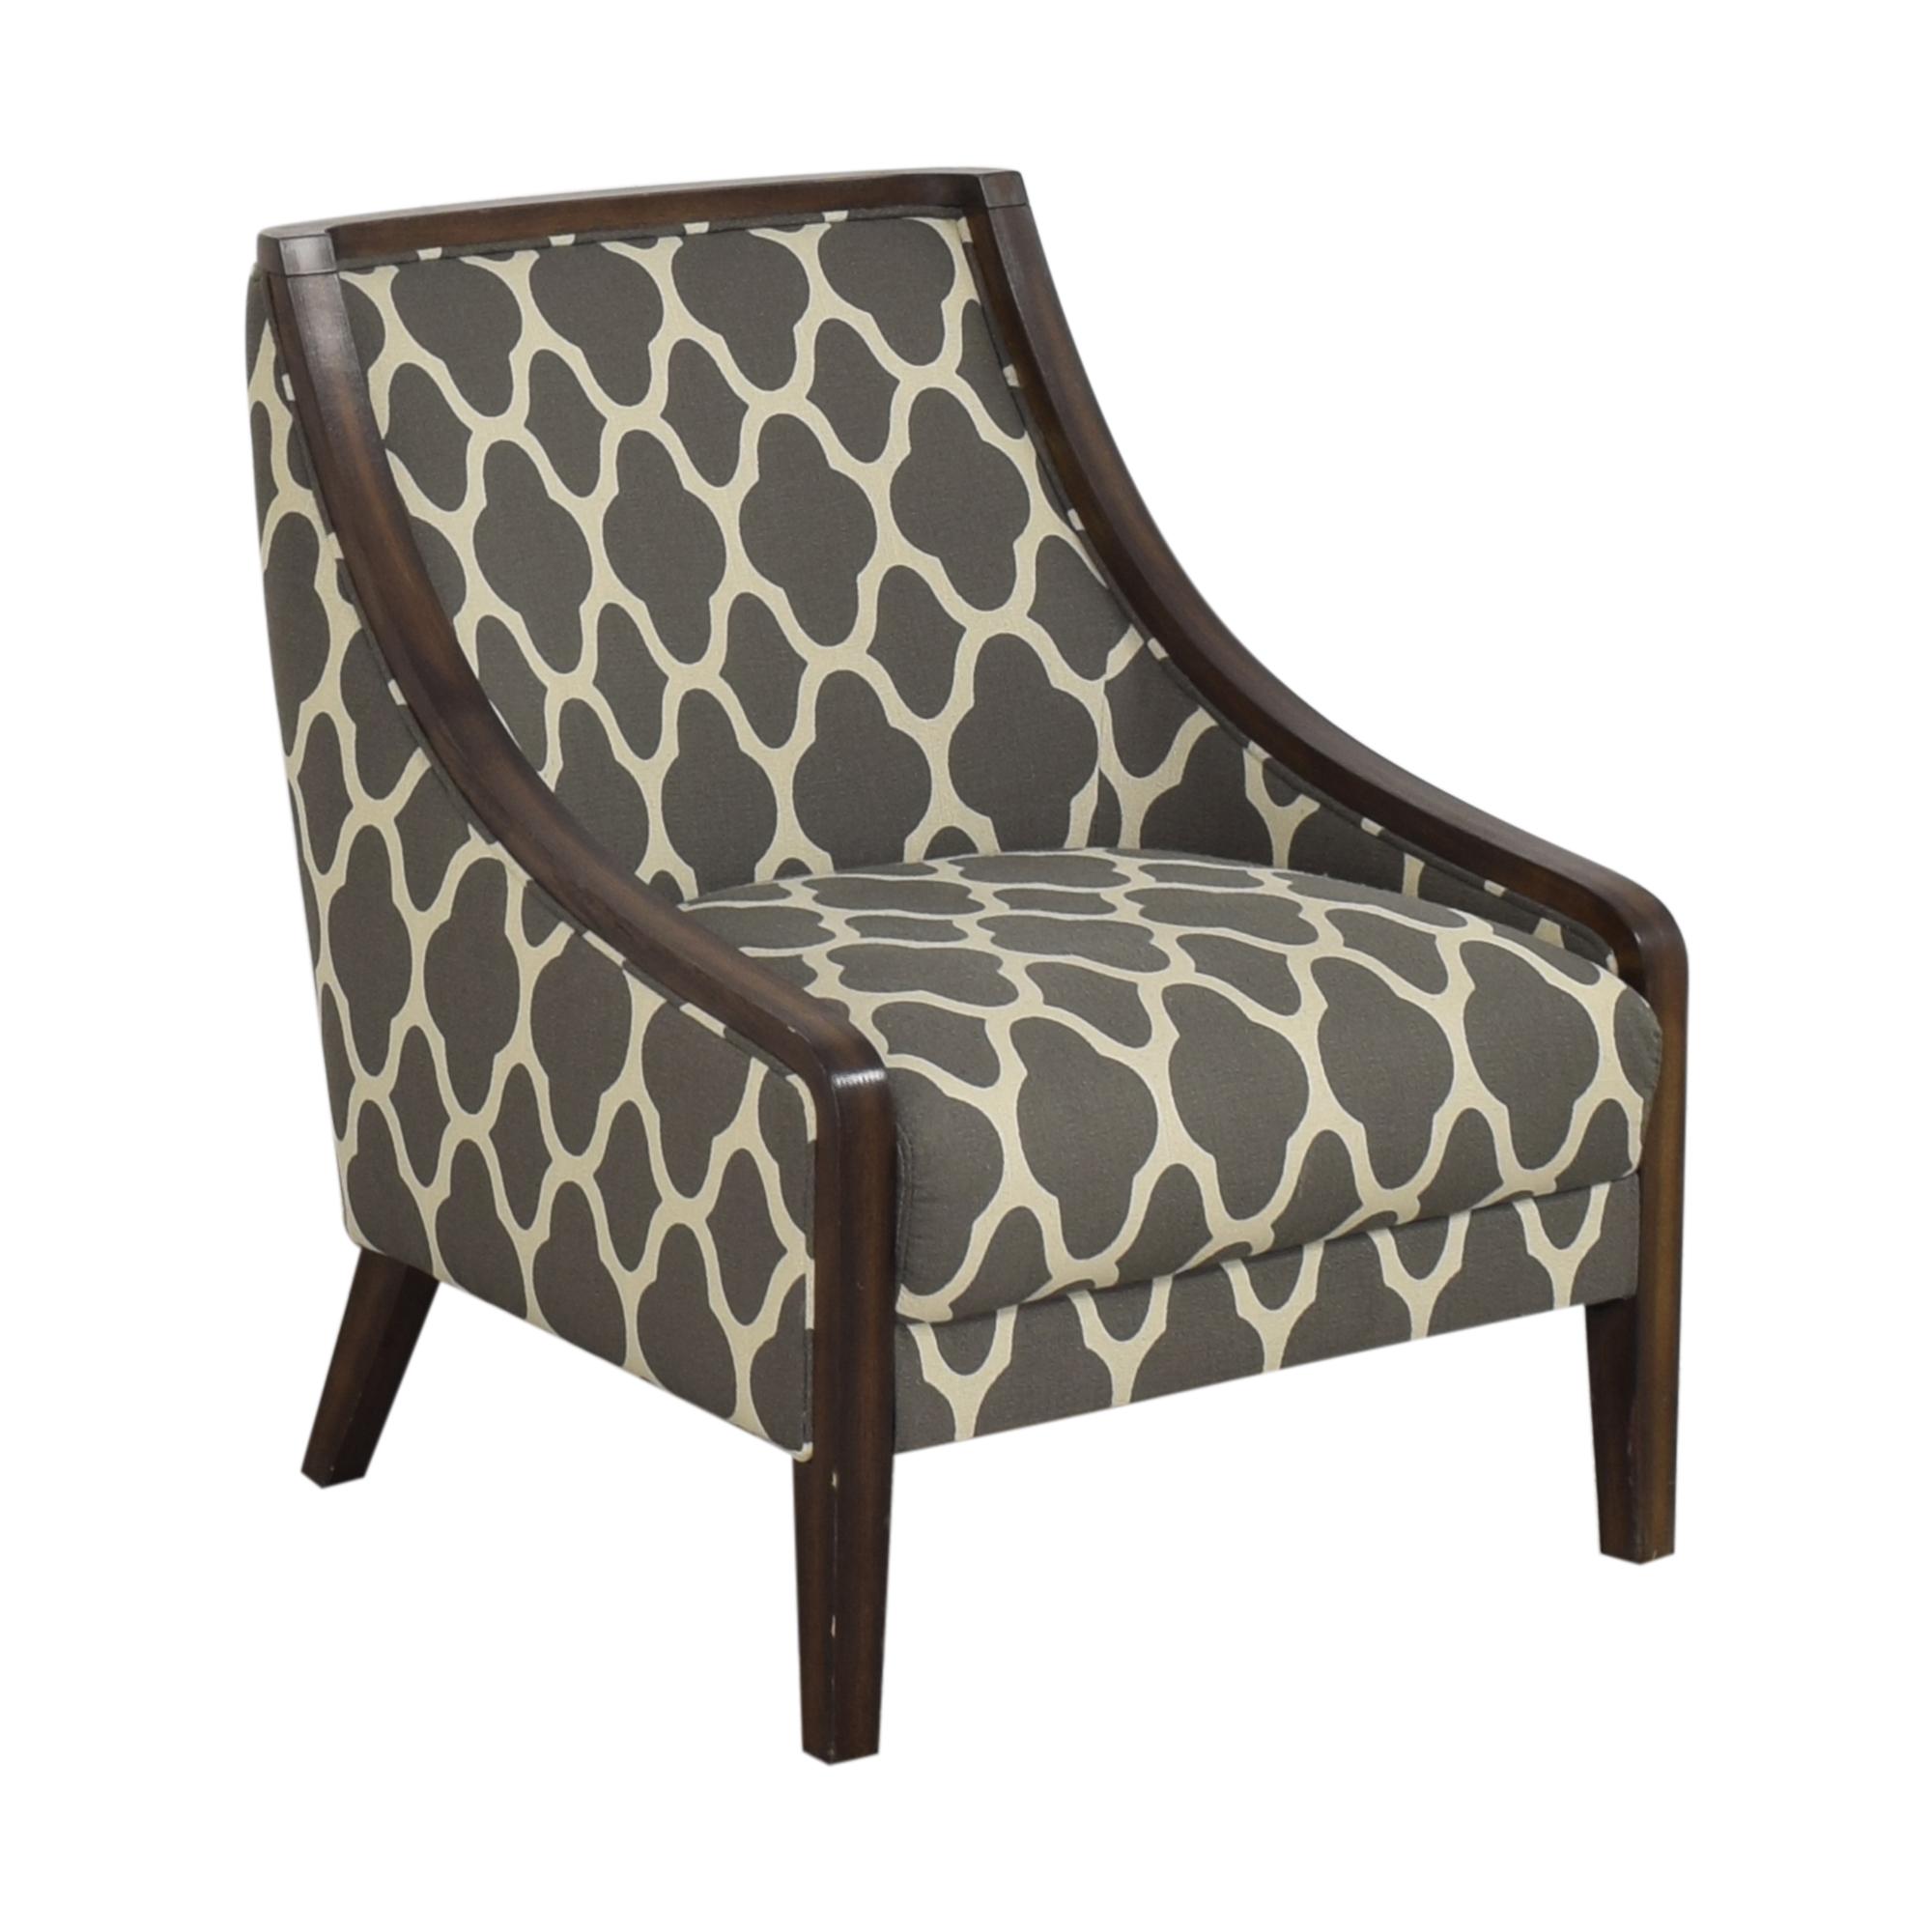 buy Macy's Macy's Quatrefoil Accent Chair online